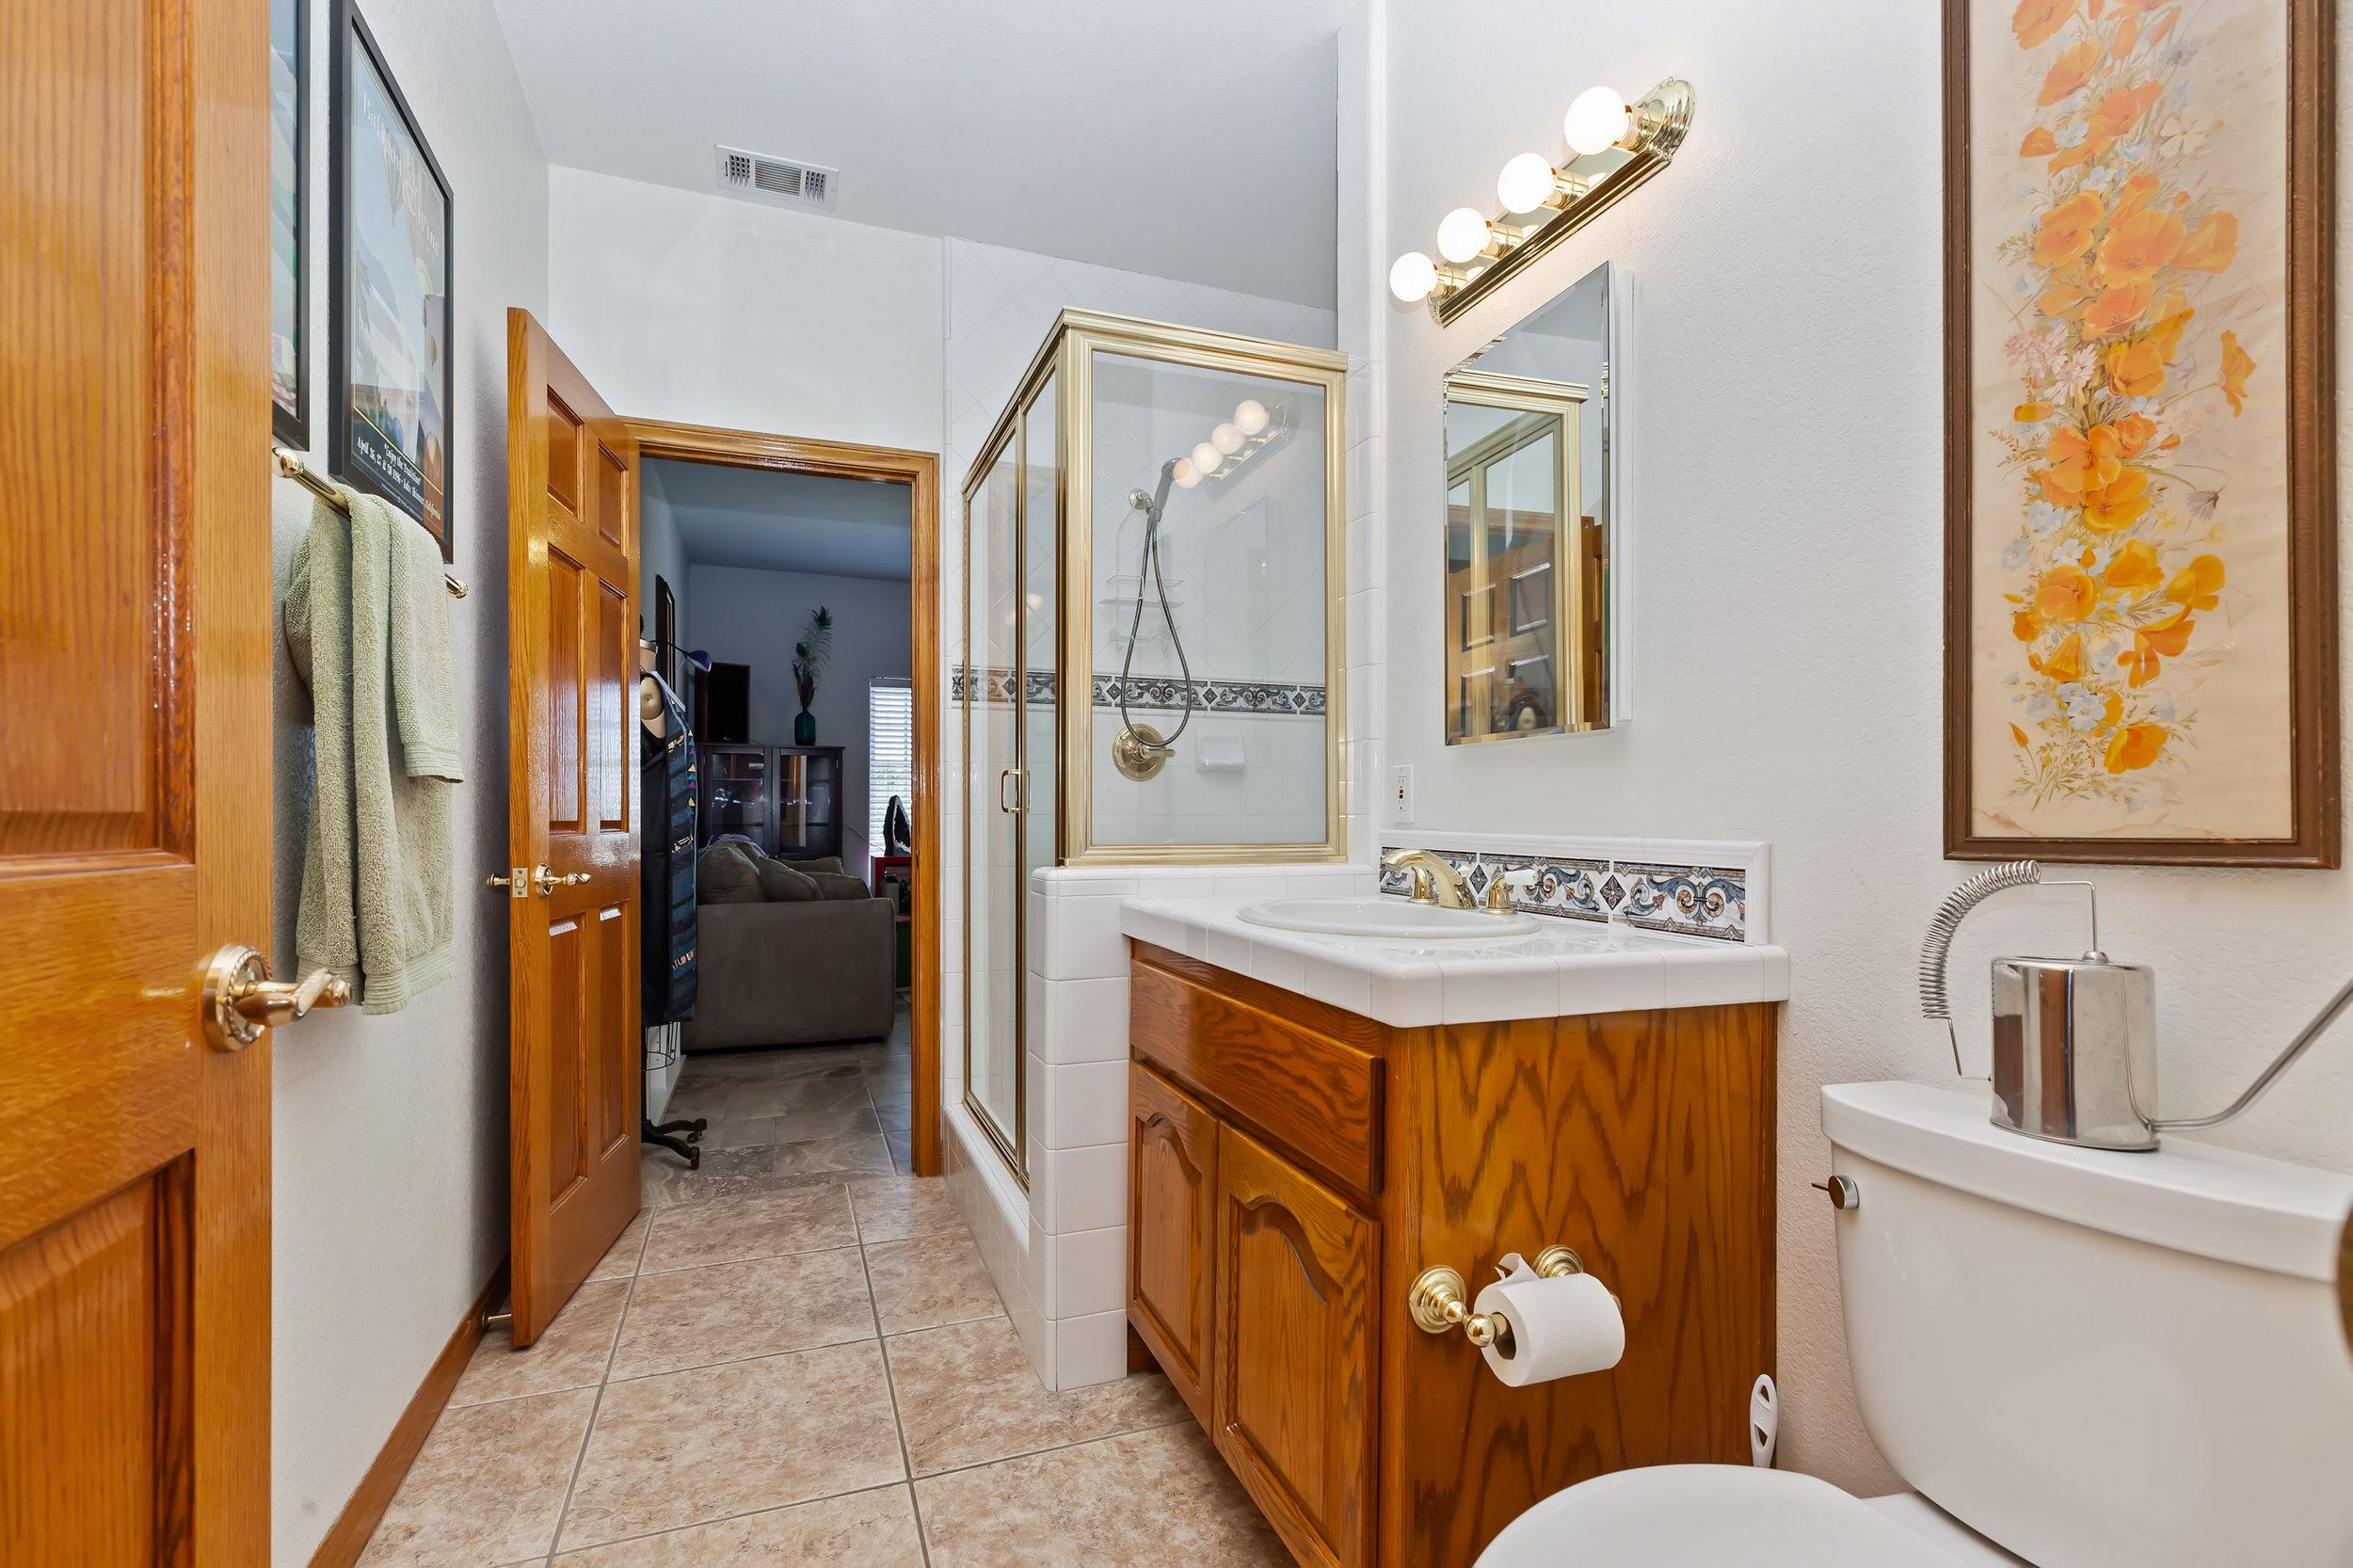 027_Bathroom.jpg